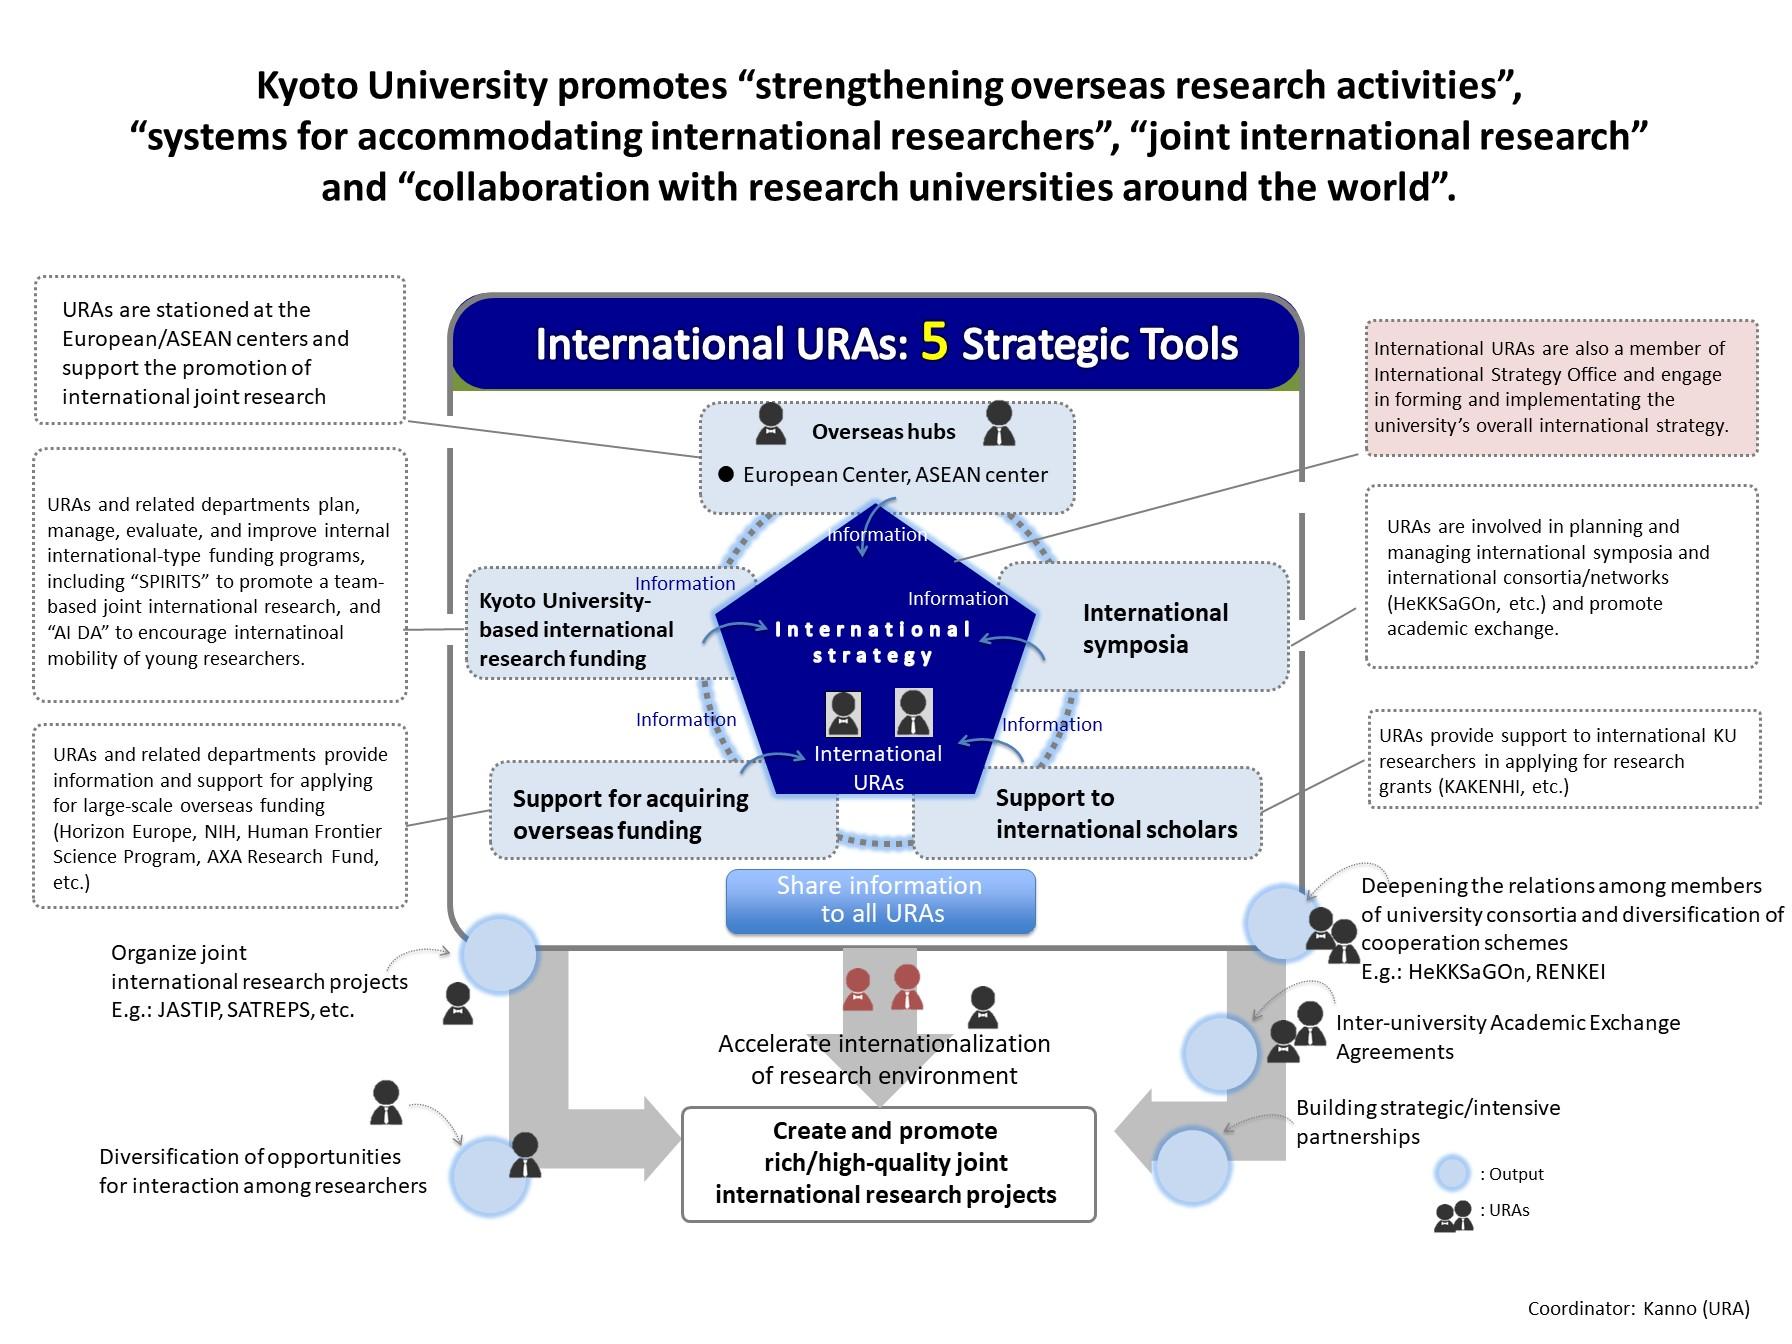 Internationalization – beyond areas/cultures